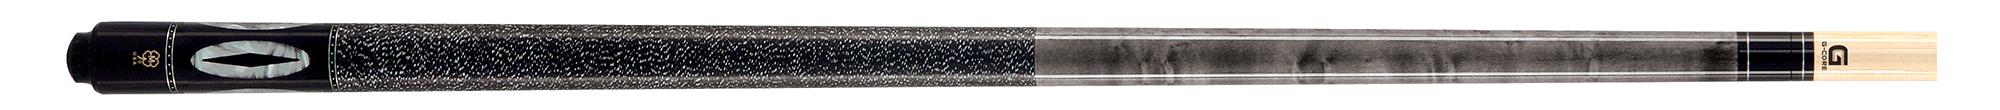 PK3011: McDermott G214 Titanium Grey/inlay pool Gewicht: 19Oz #1